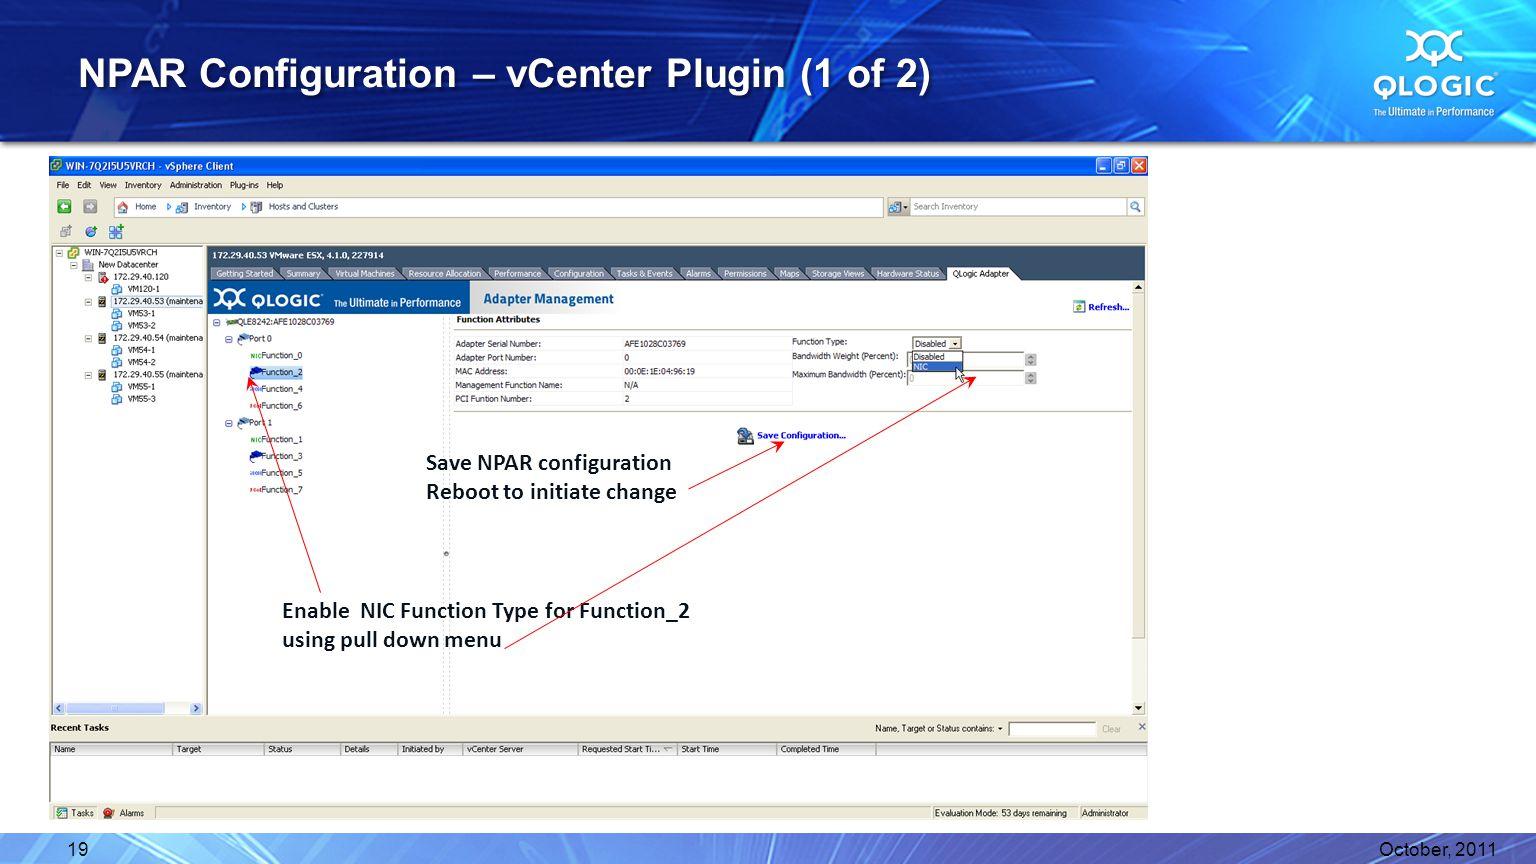 NPAR Configuration – vCenter Plugin (1 of 2)